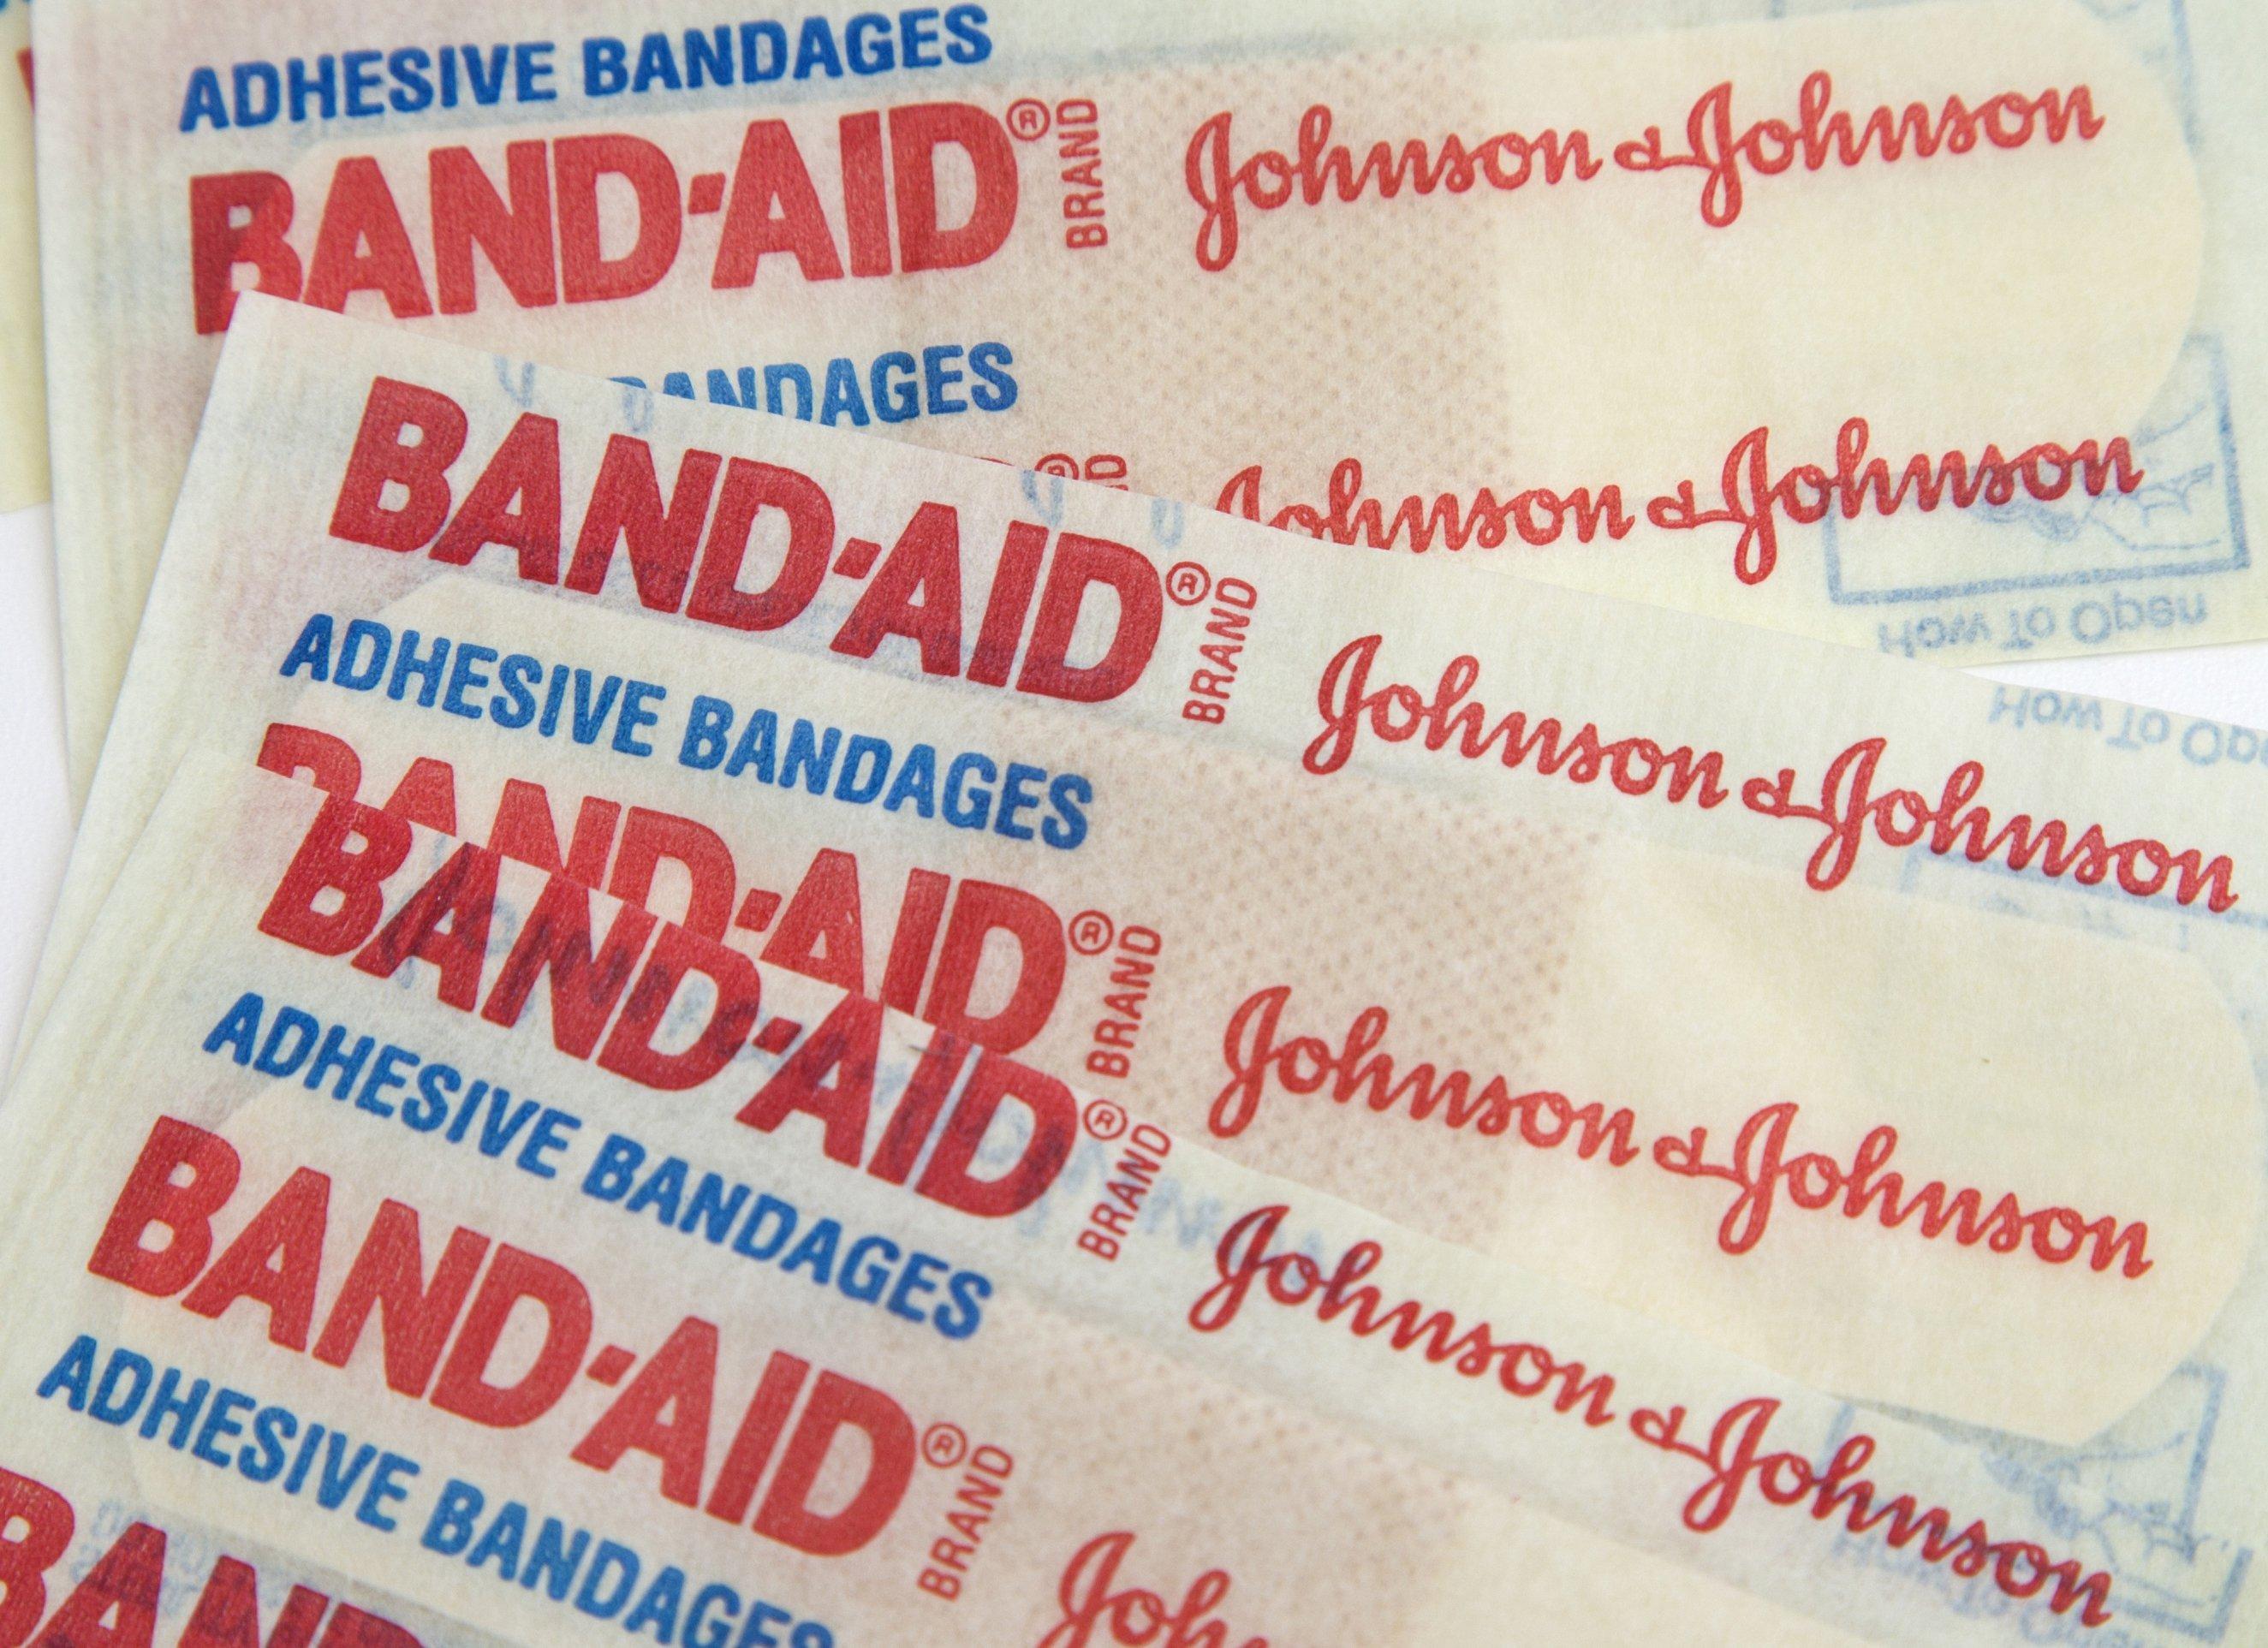 Johnson To Buy Abbotts Vision Unit For 433B